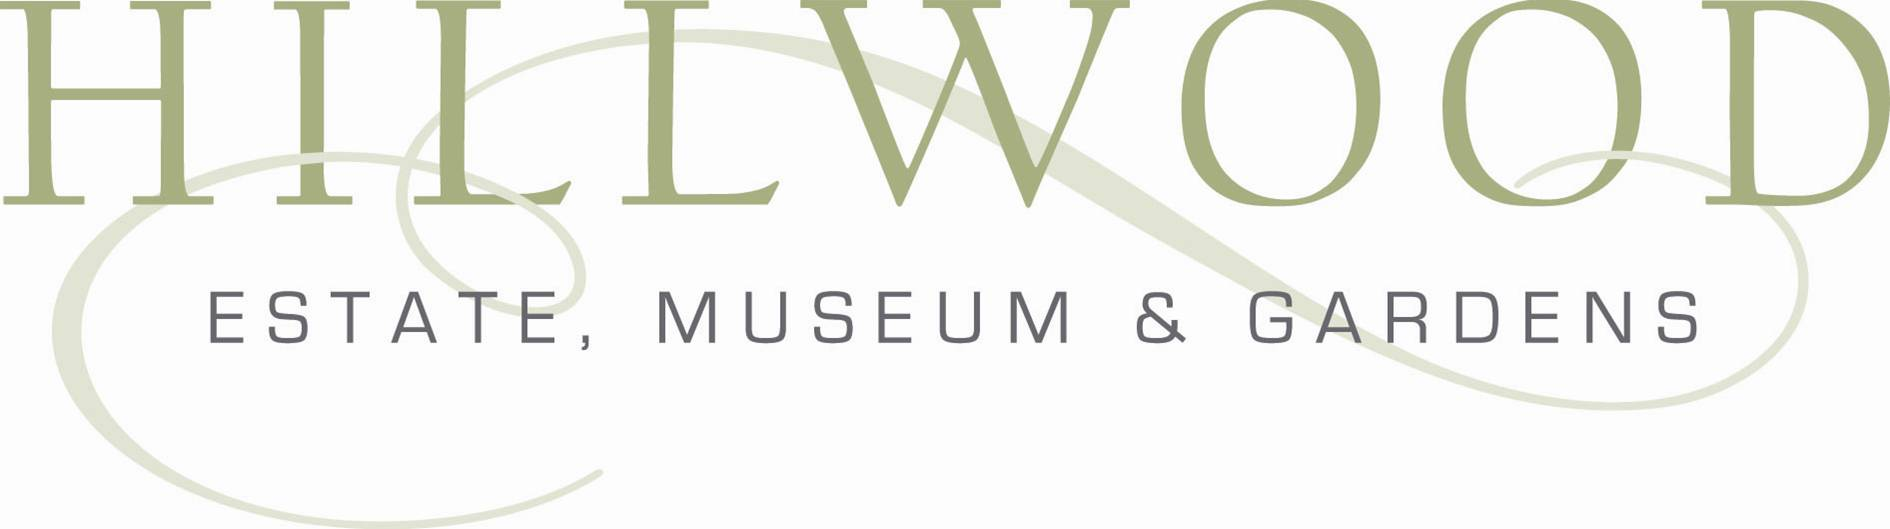 hillwood logo